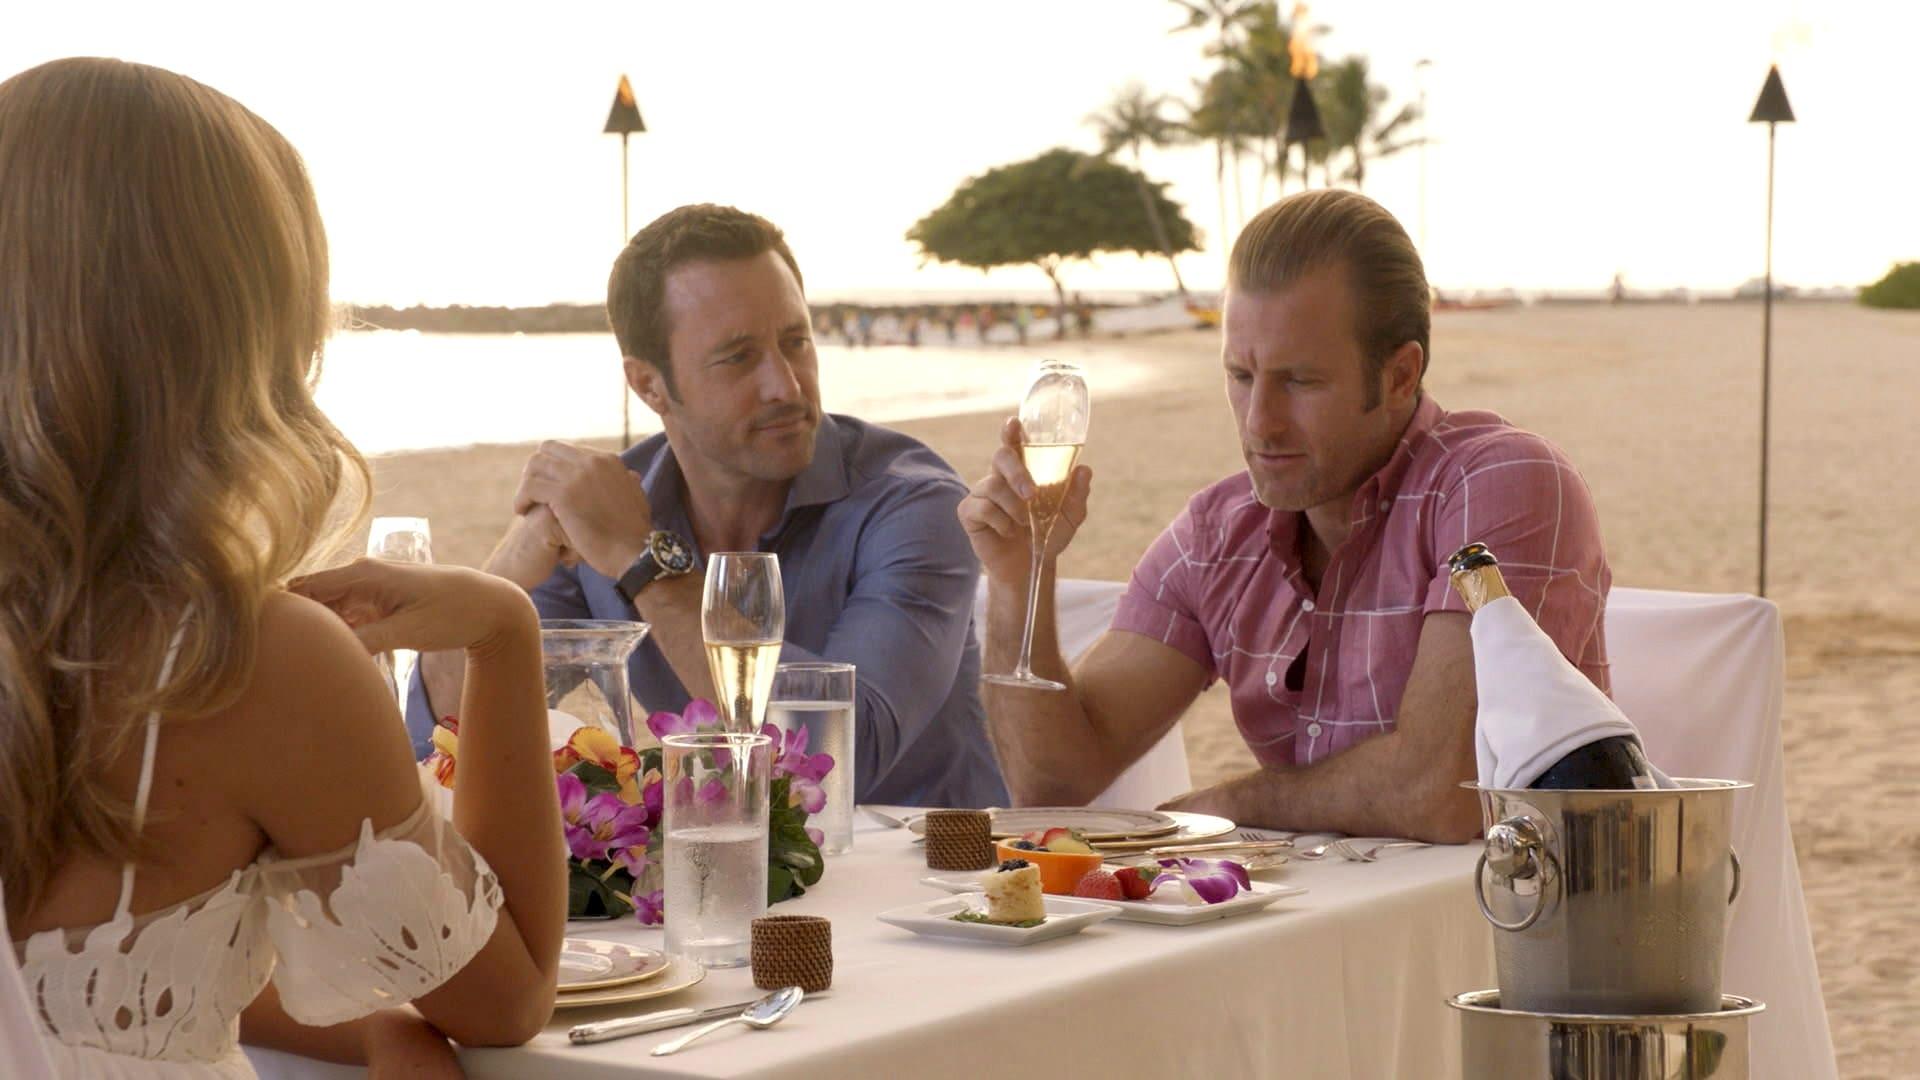 Hawaii Five-0 - Season 7 Episode 16 : Poniu I Ke Aloha (Crazy In Love)